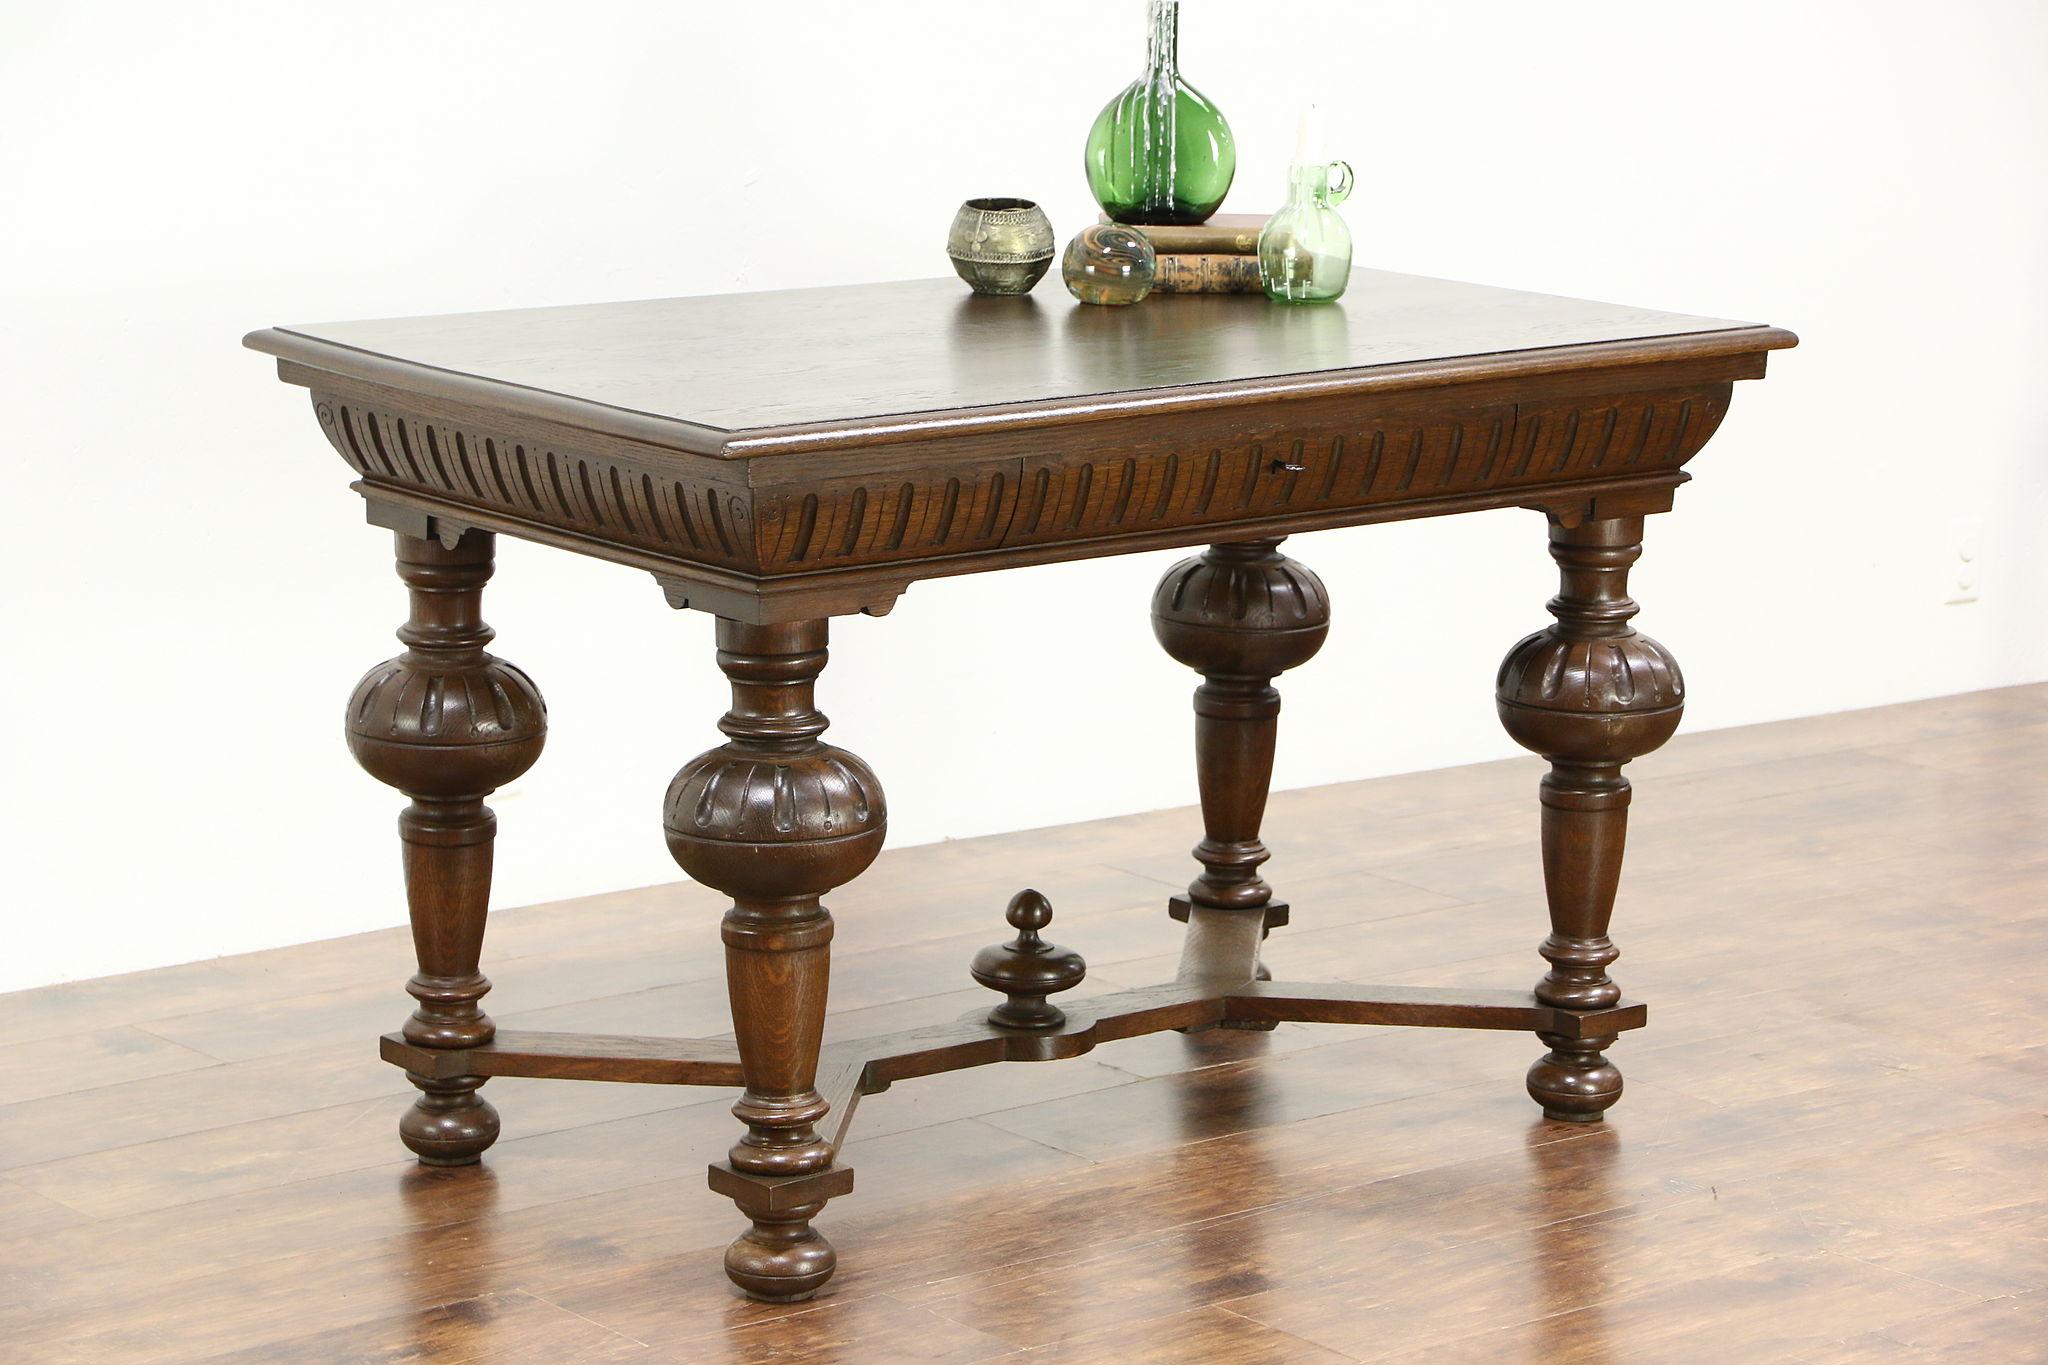 Renaissance Design Carved Oak Antique European Library Table Or Writing Desk